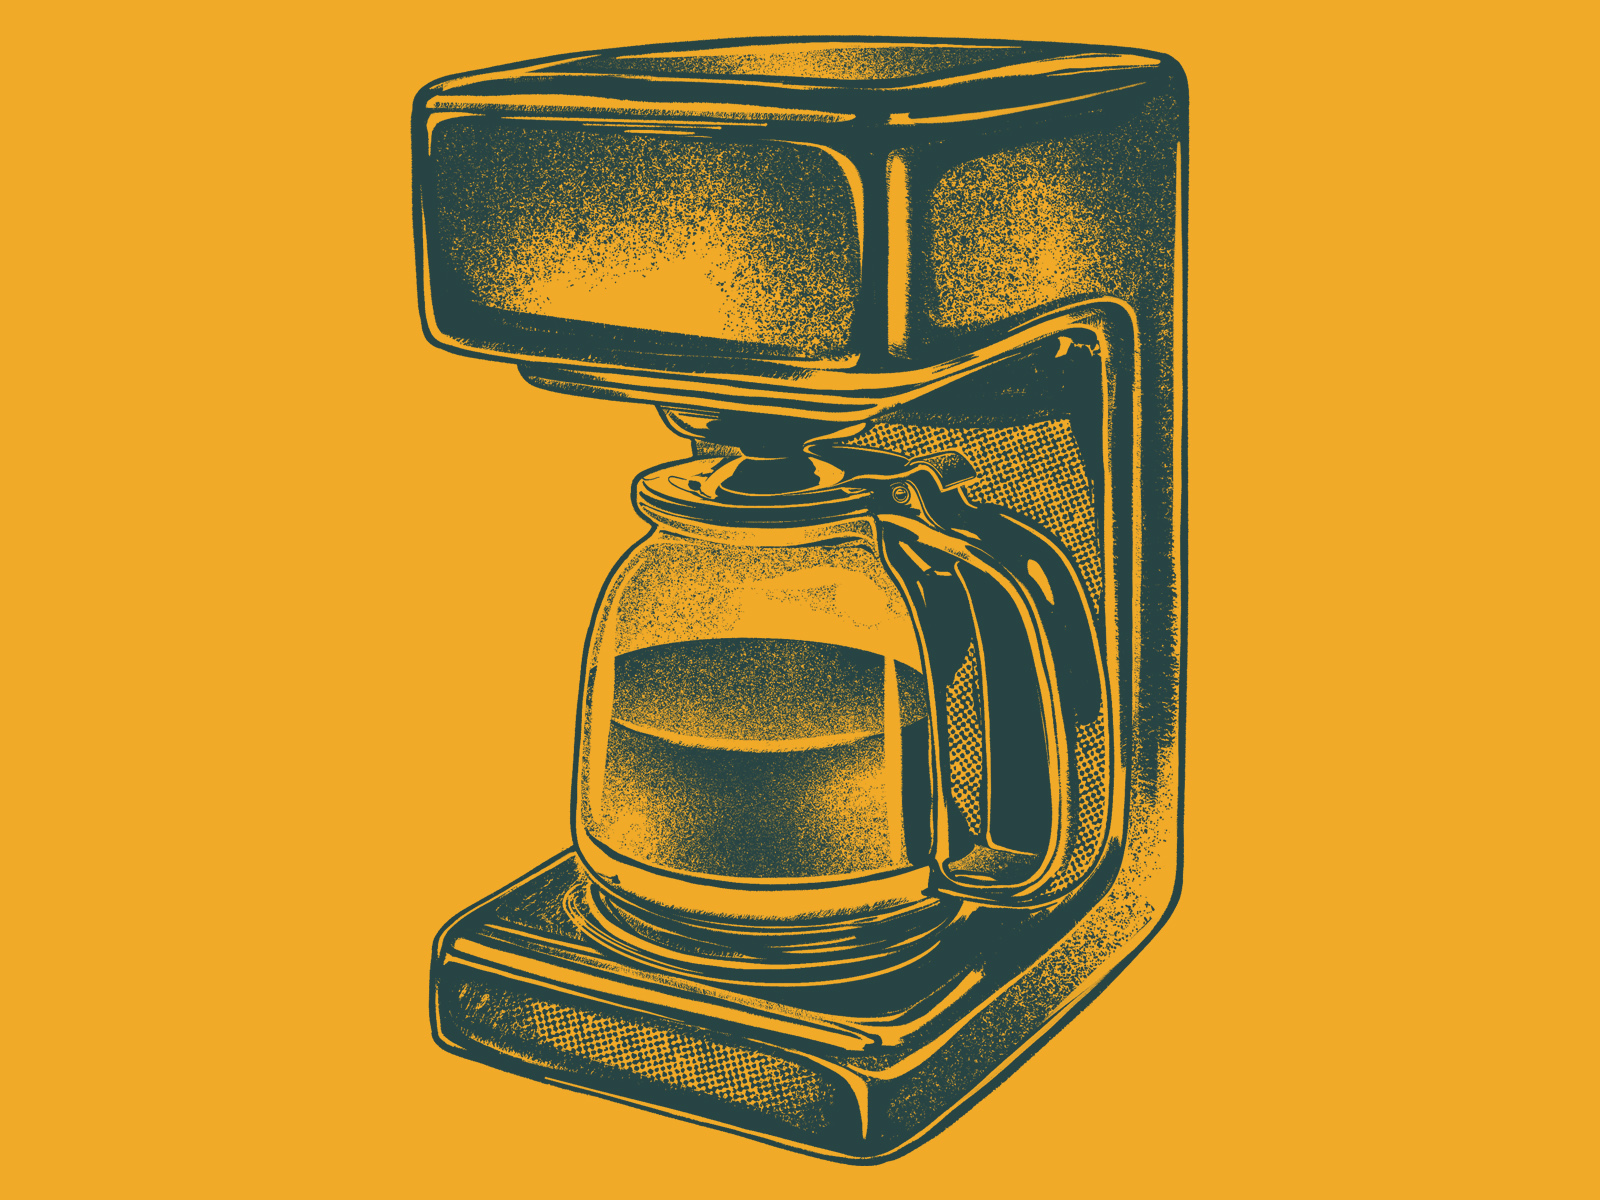 2019-11-11 – Coffee Machine